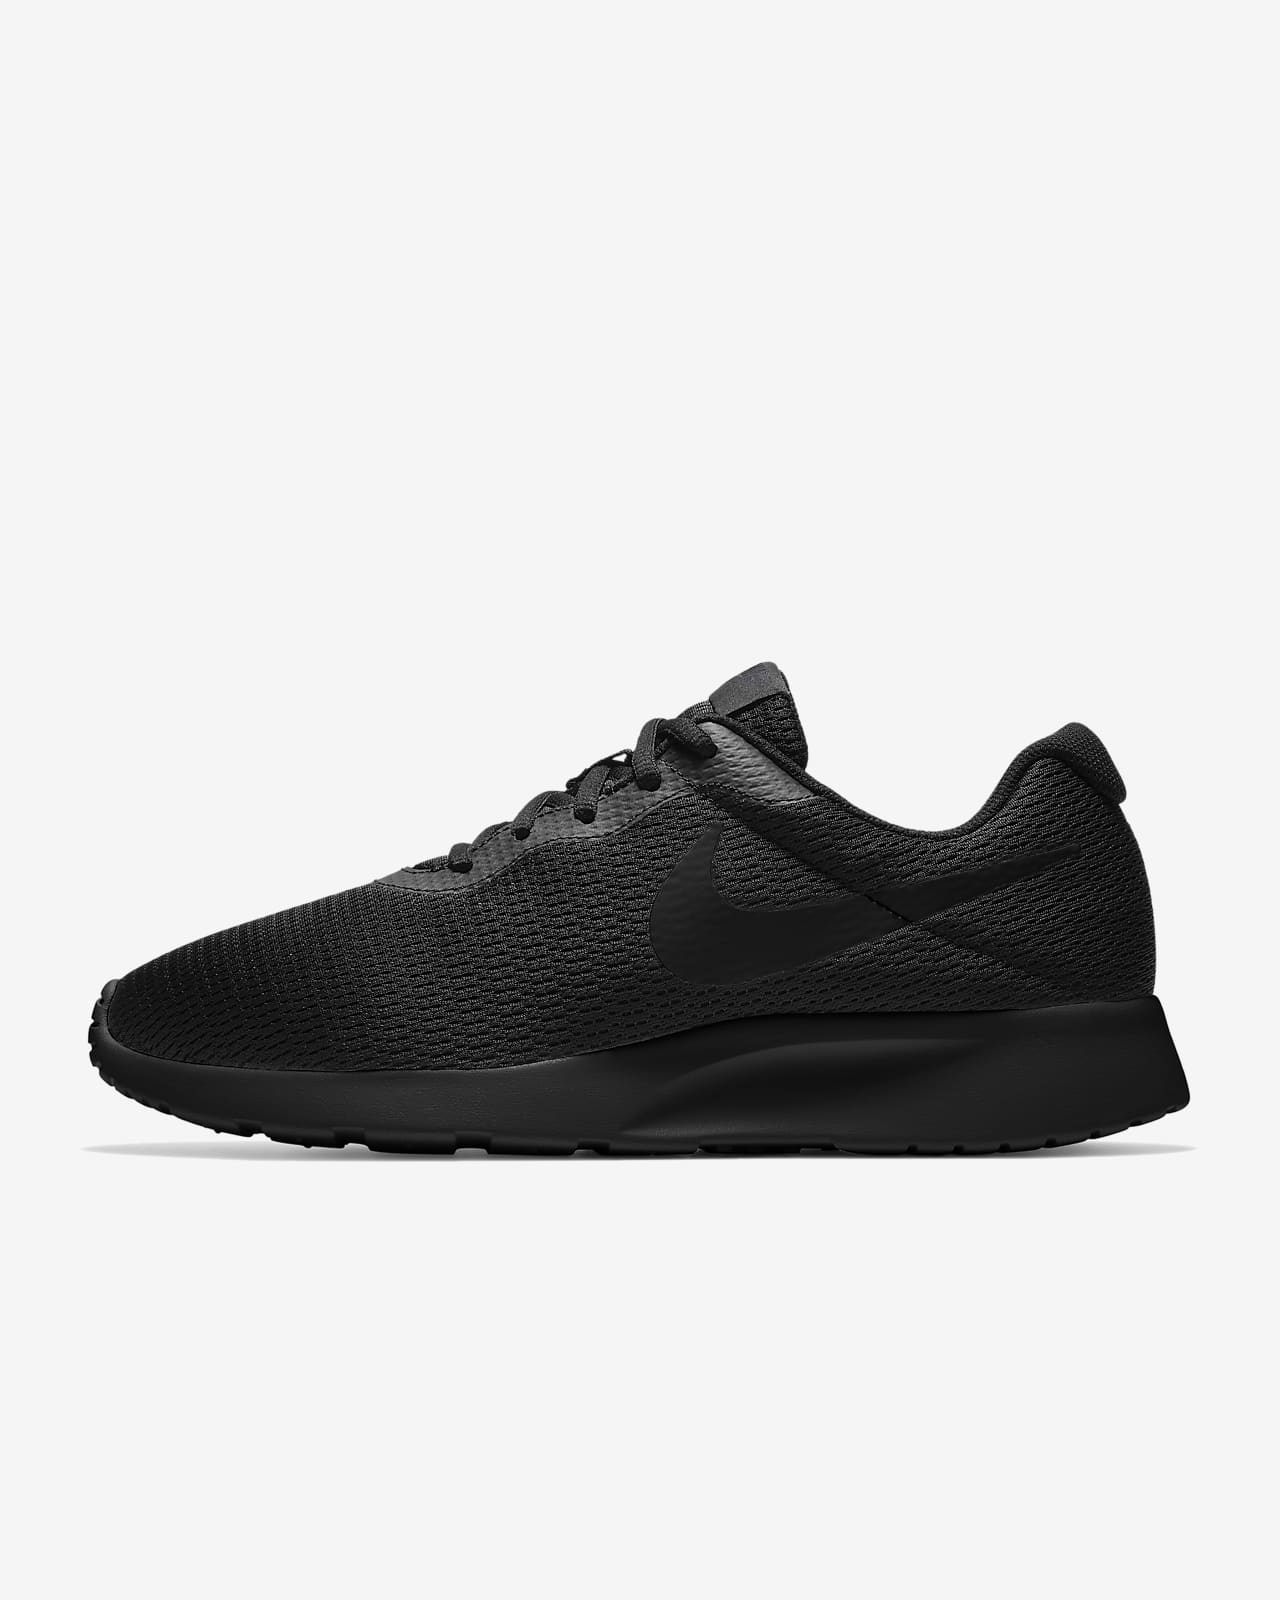 Calzado para hombre Nike Tanjun Wide (4E)